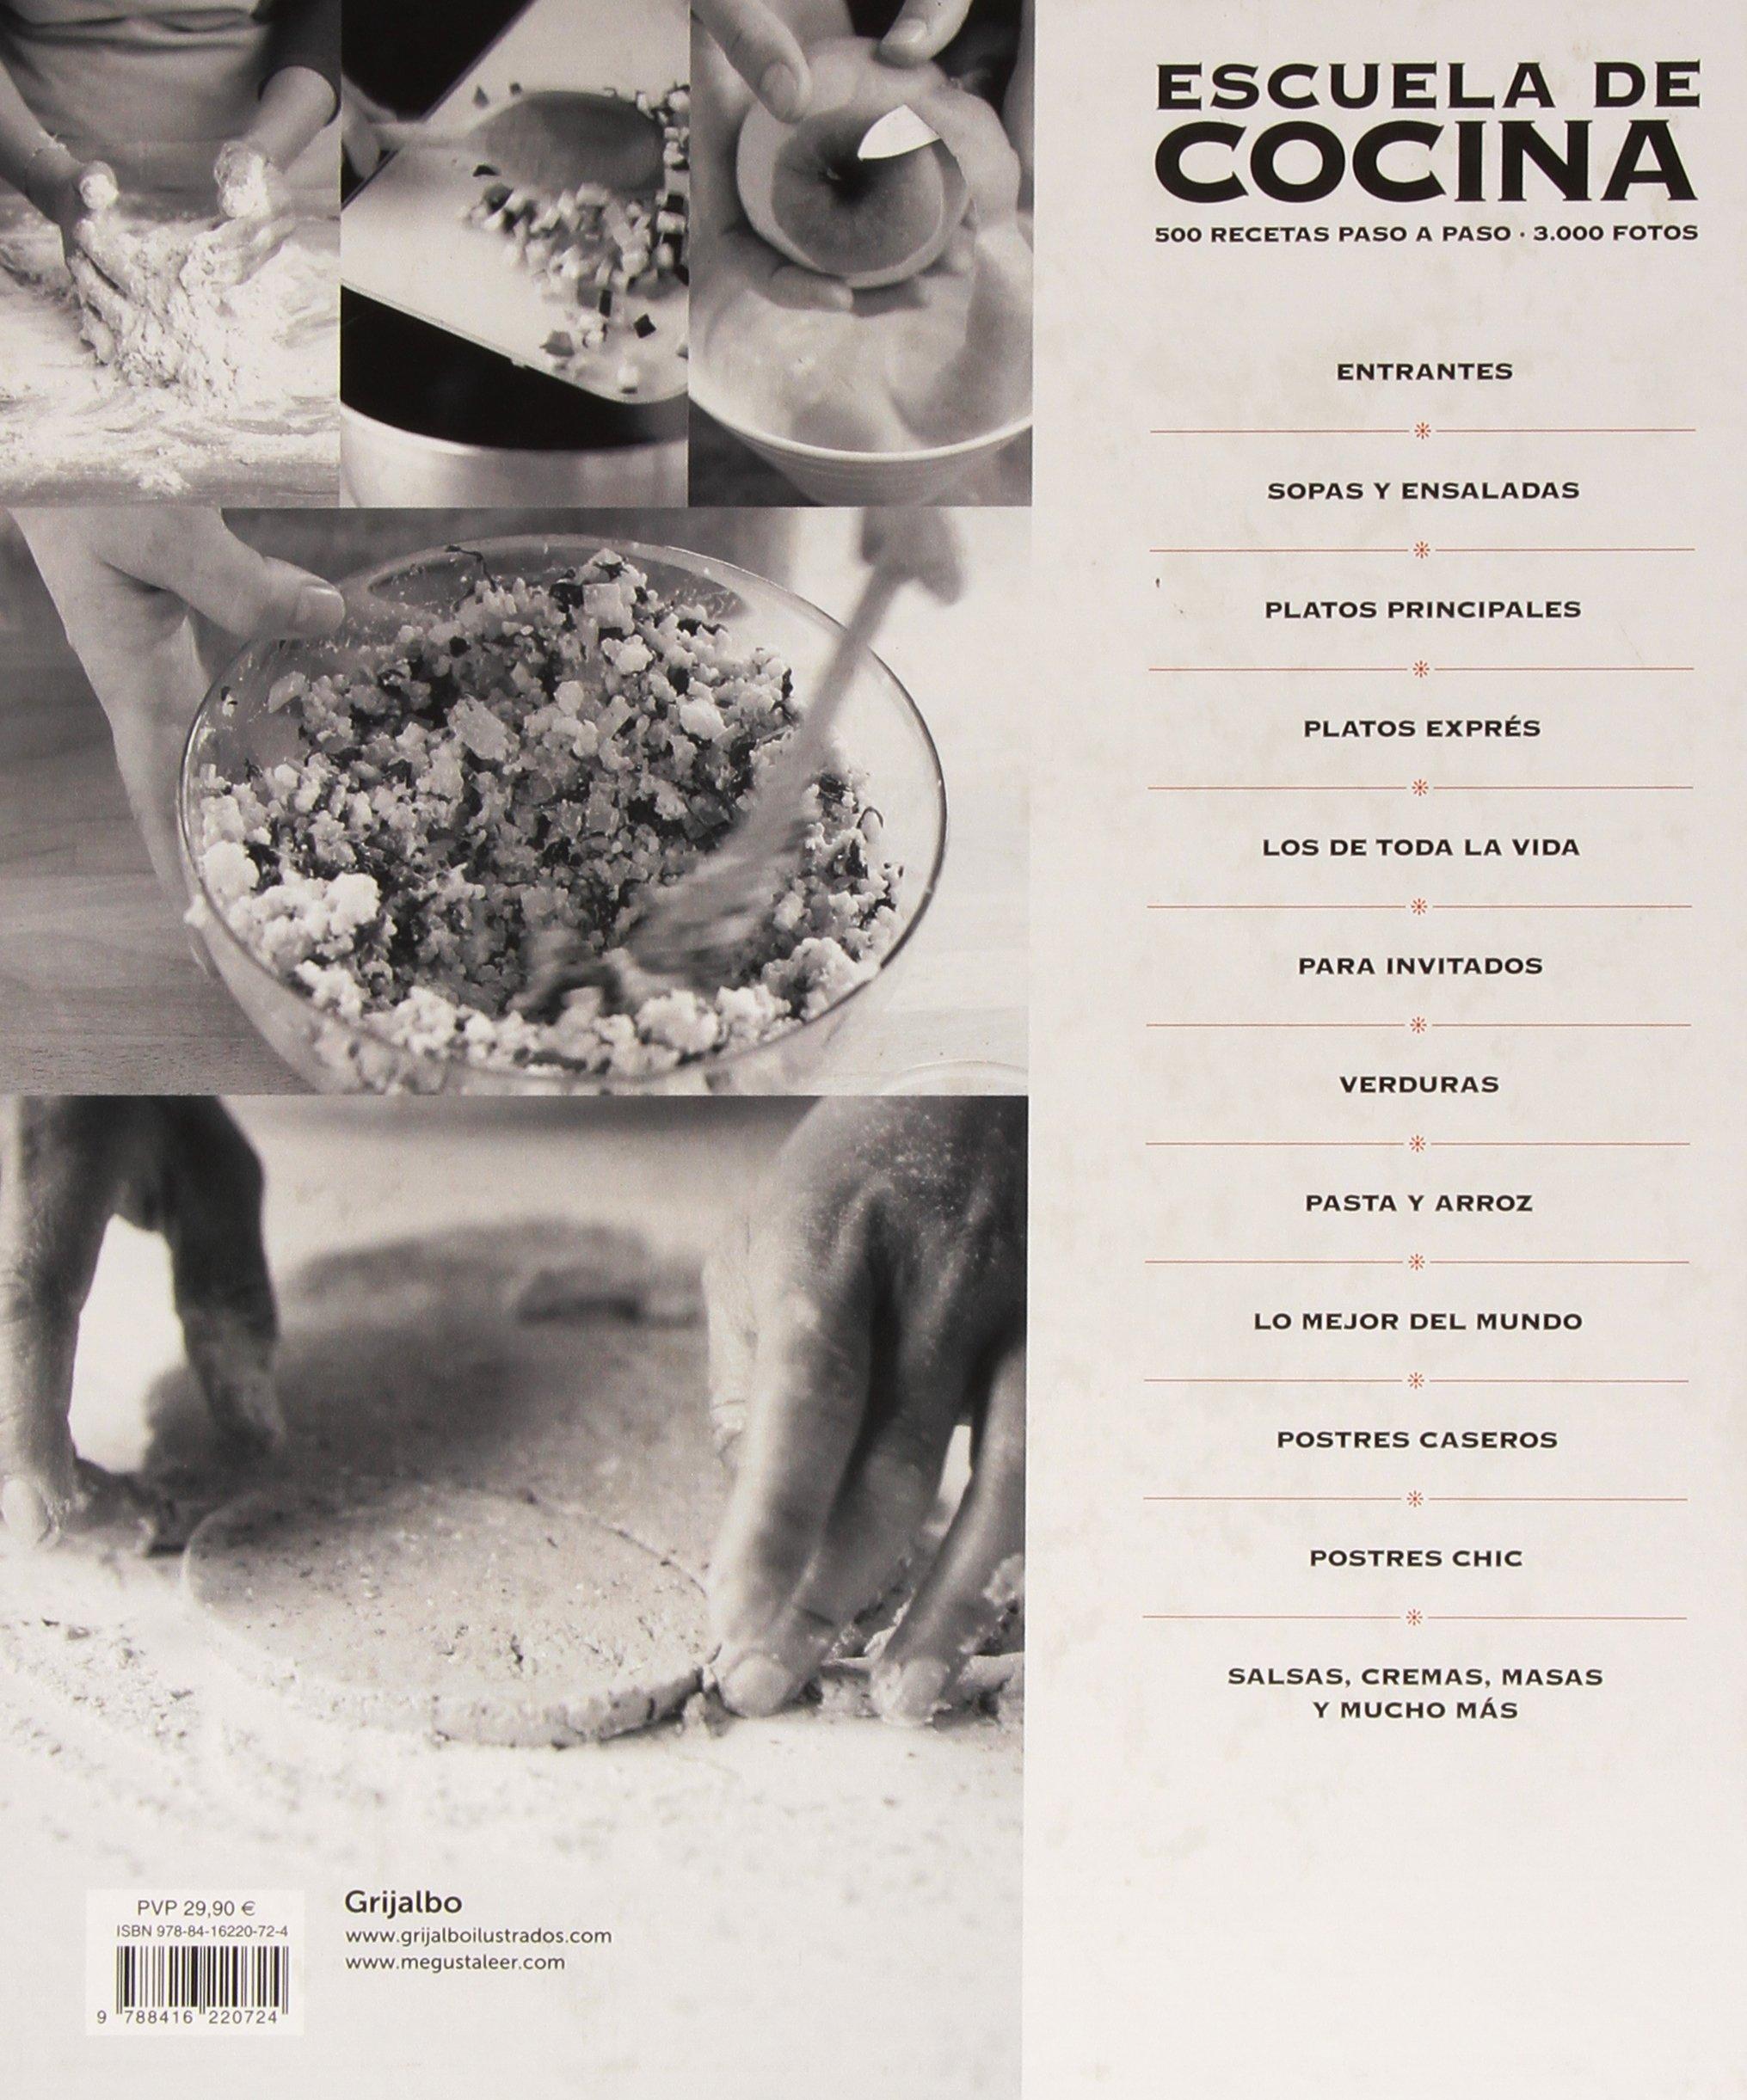 Escuela de cocina (edición actualizada): 500 recetas paso a paso - 3000 fotos (Spanish Edition): Varios autores: 9788416220724: Amazon.com: Books